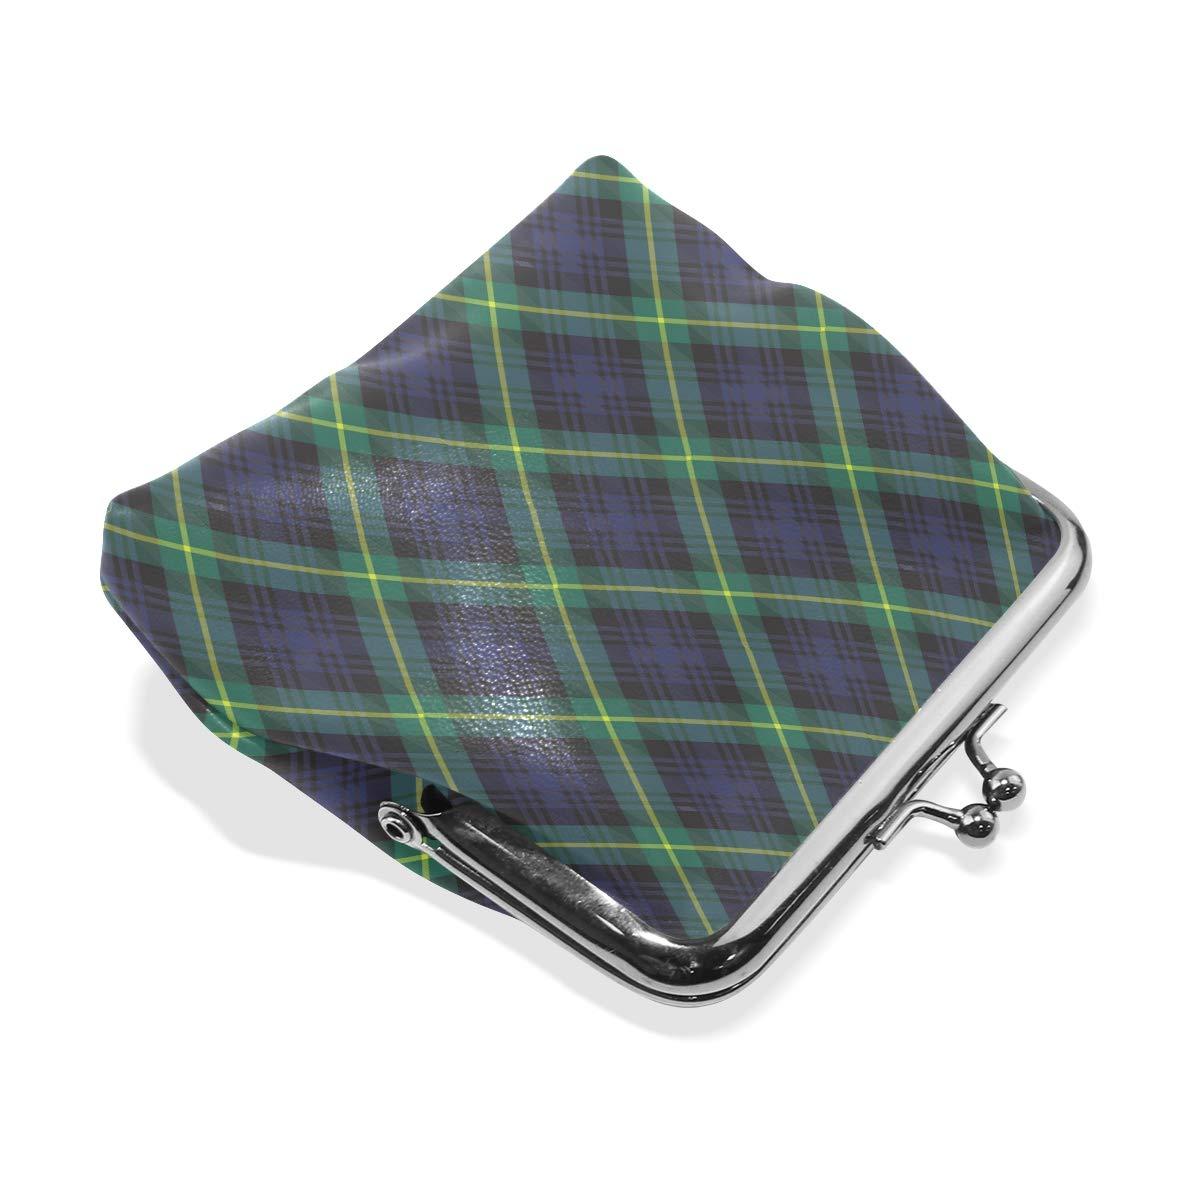 Exquisite Buckle Coin Purses Gordon Tartan Textile Vector Mini Wallet Key Card Holder Purse for Women